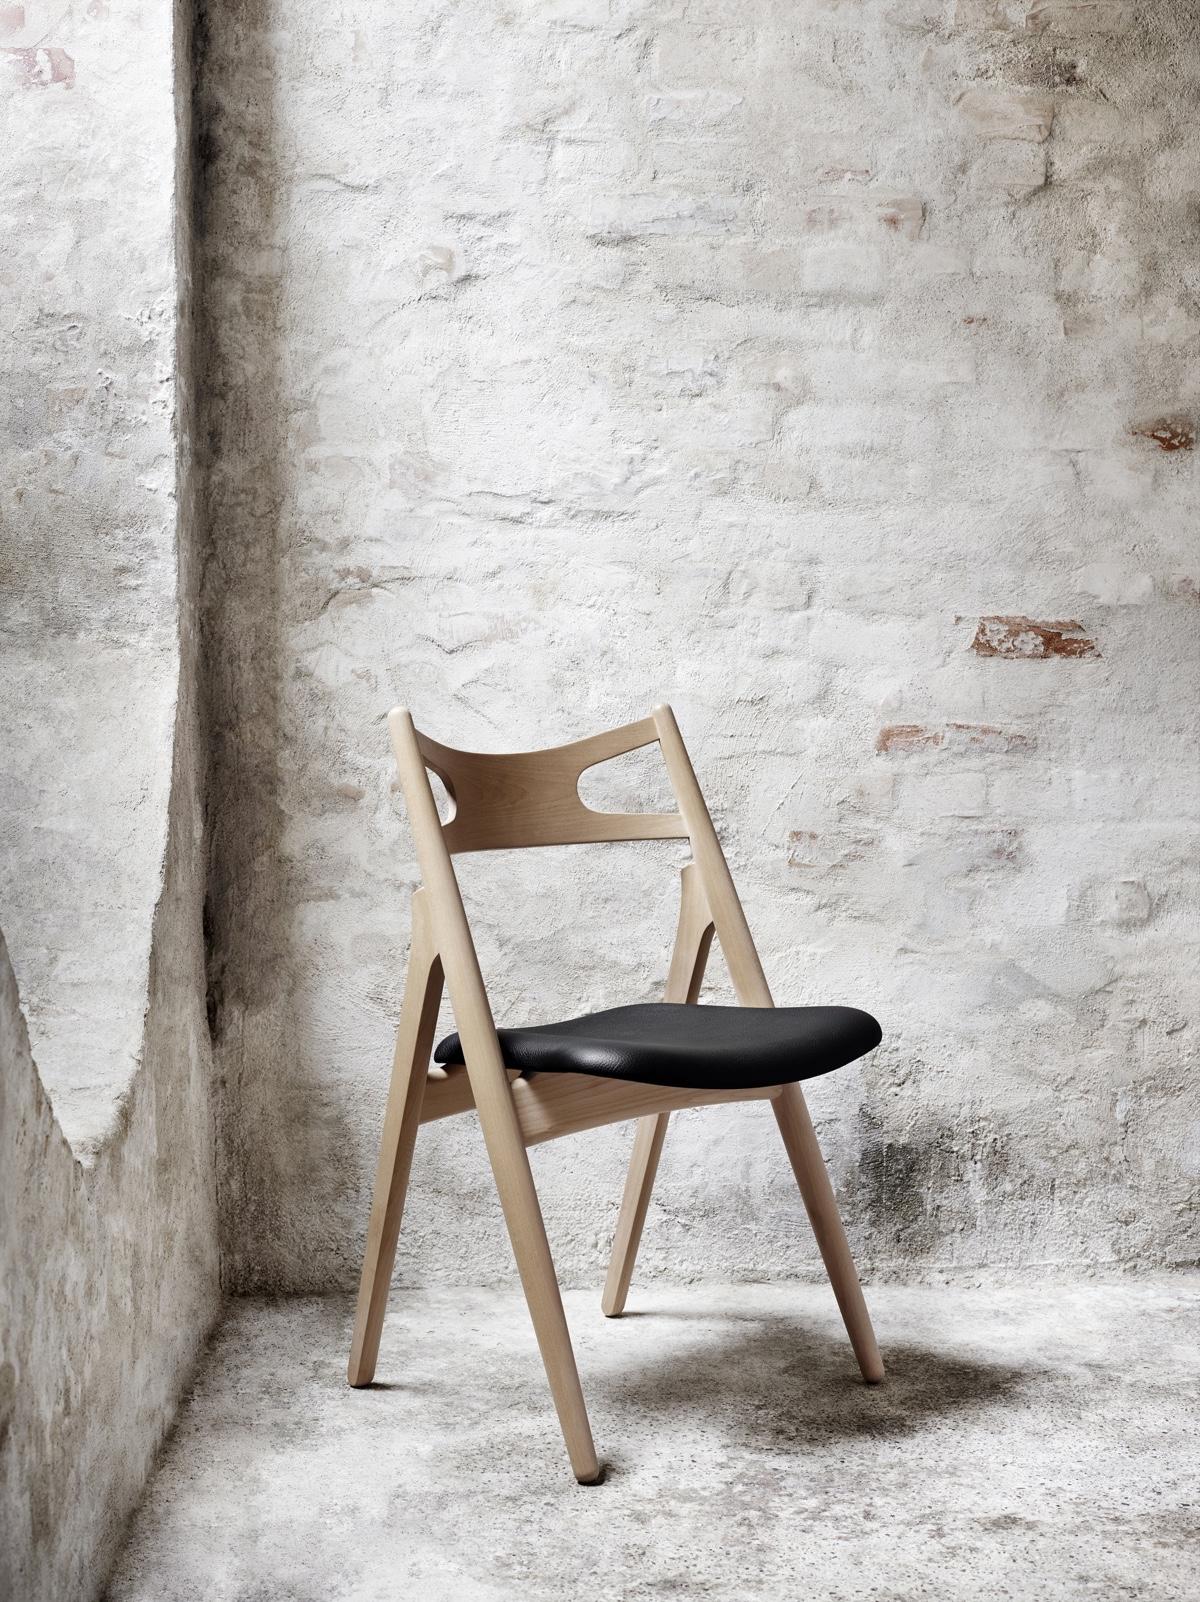 CH29 Sawbuck Chair designed in 1952 by Hans J. Wegner.